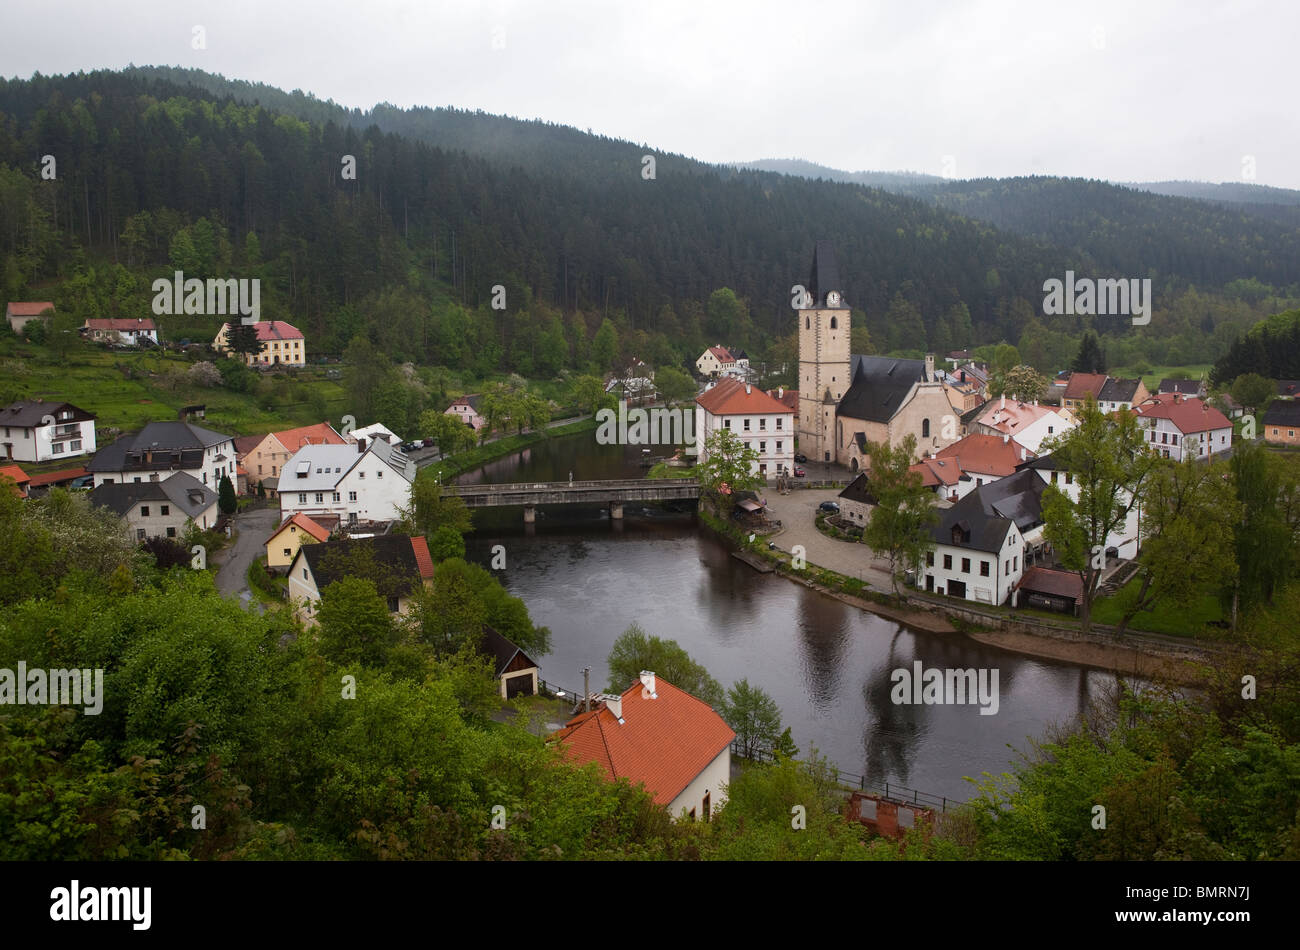 Rozmberk nad Vltavou village in a Moldau river curve, southern Bohemia, Czech republic - Stock Image